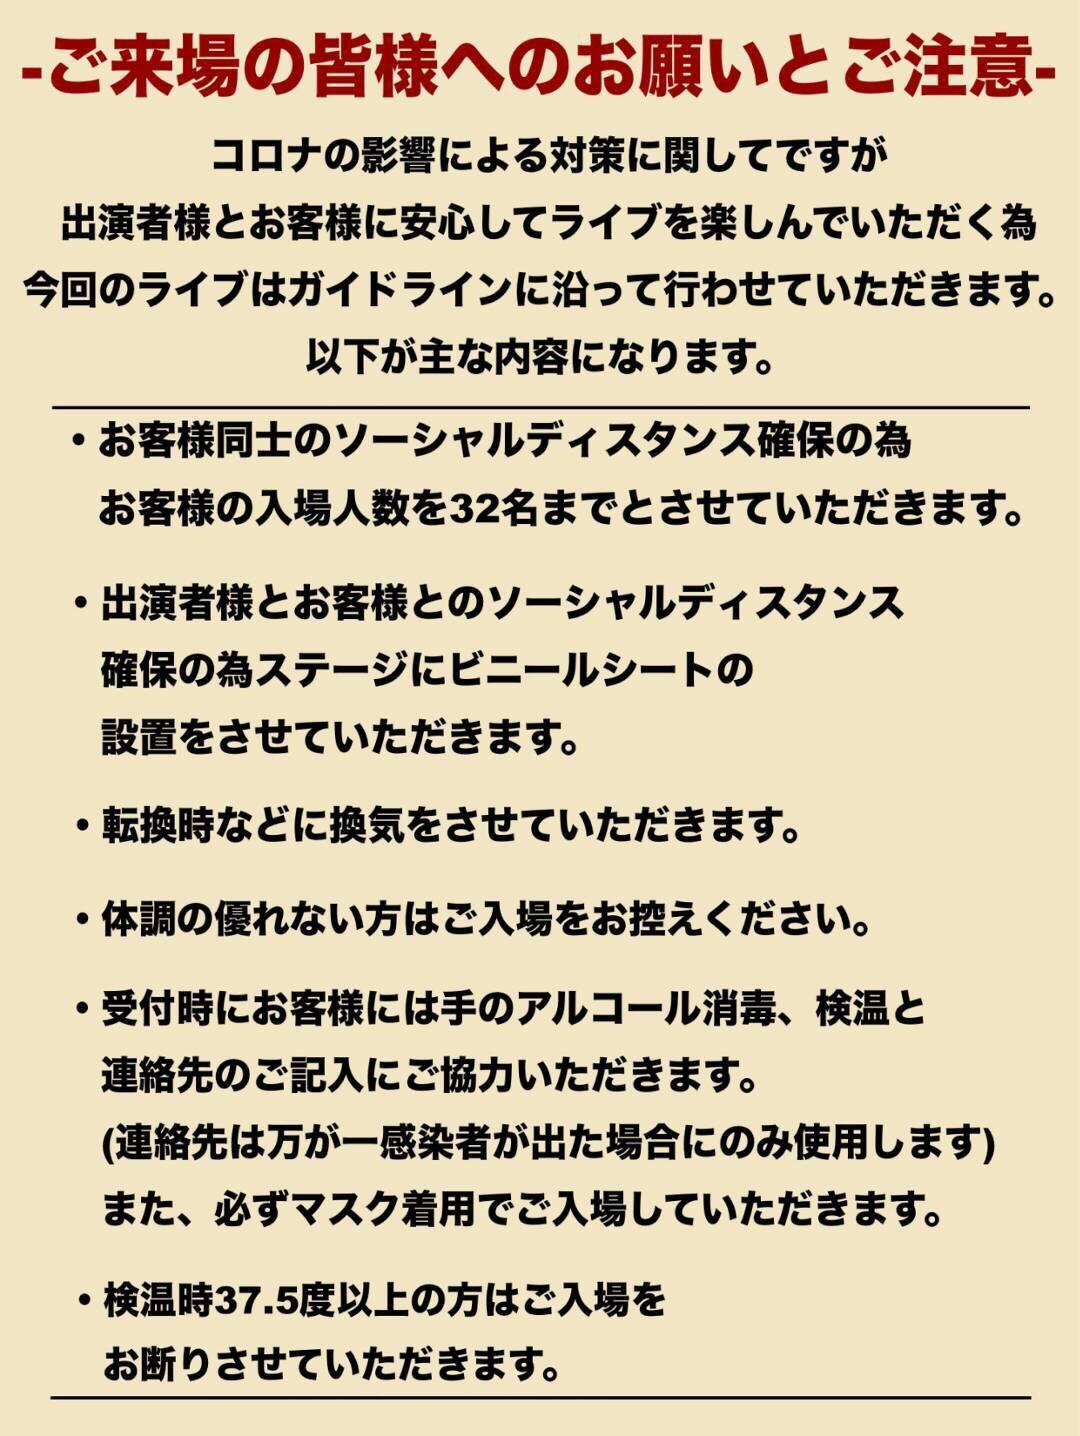 TAKUBILLY PRESENTS【BAREBACKS諫早2】の写真